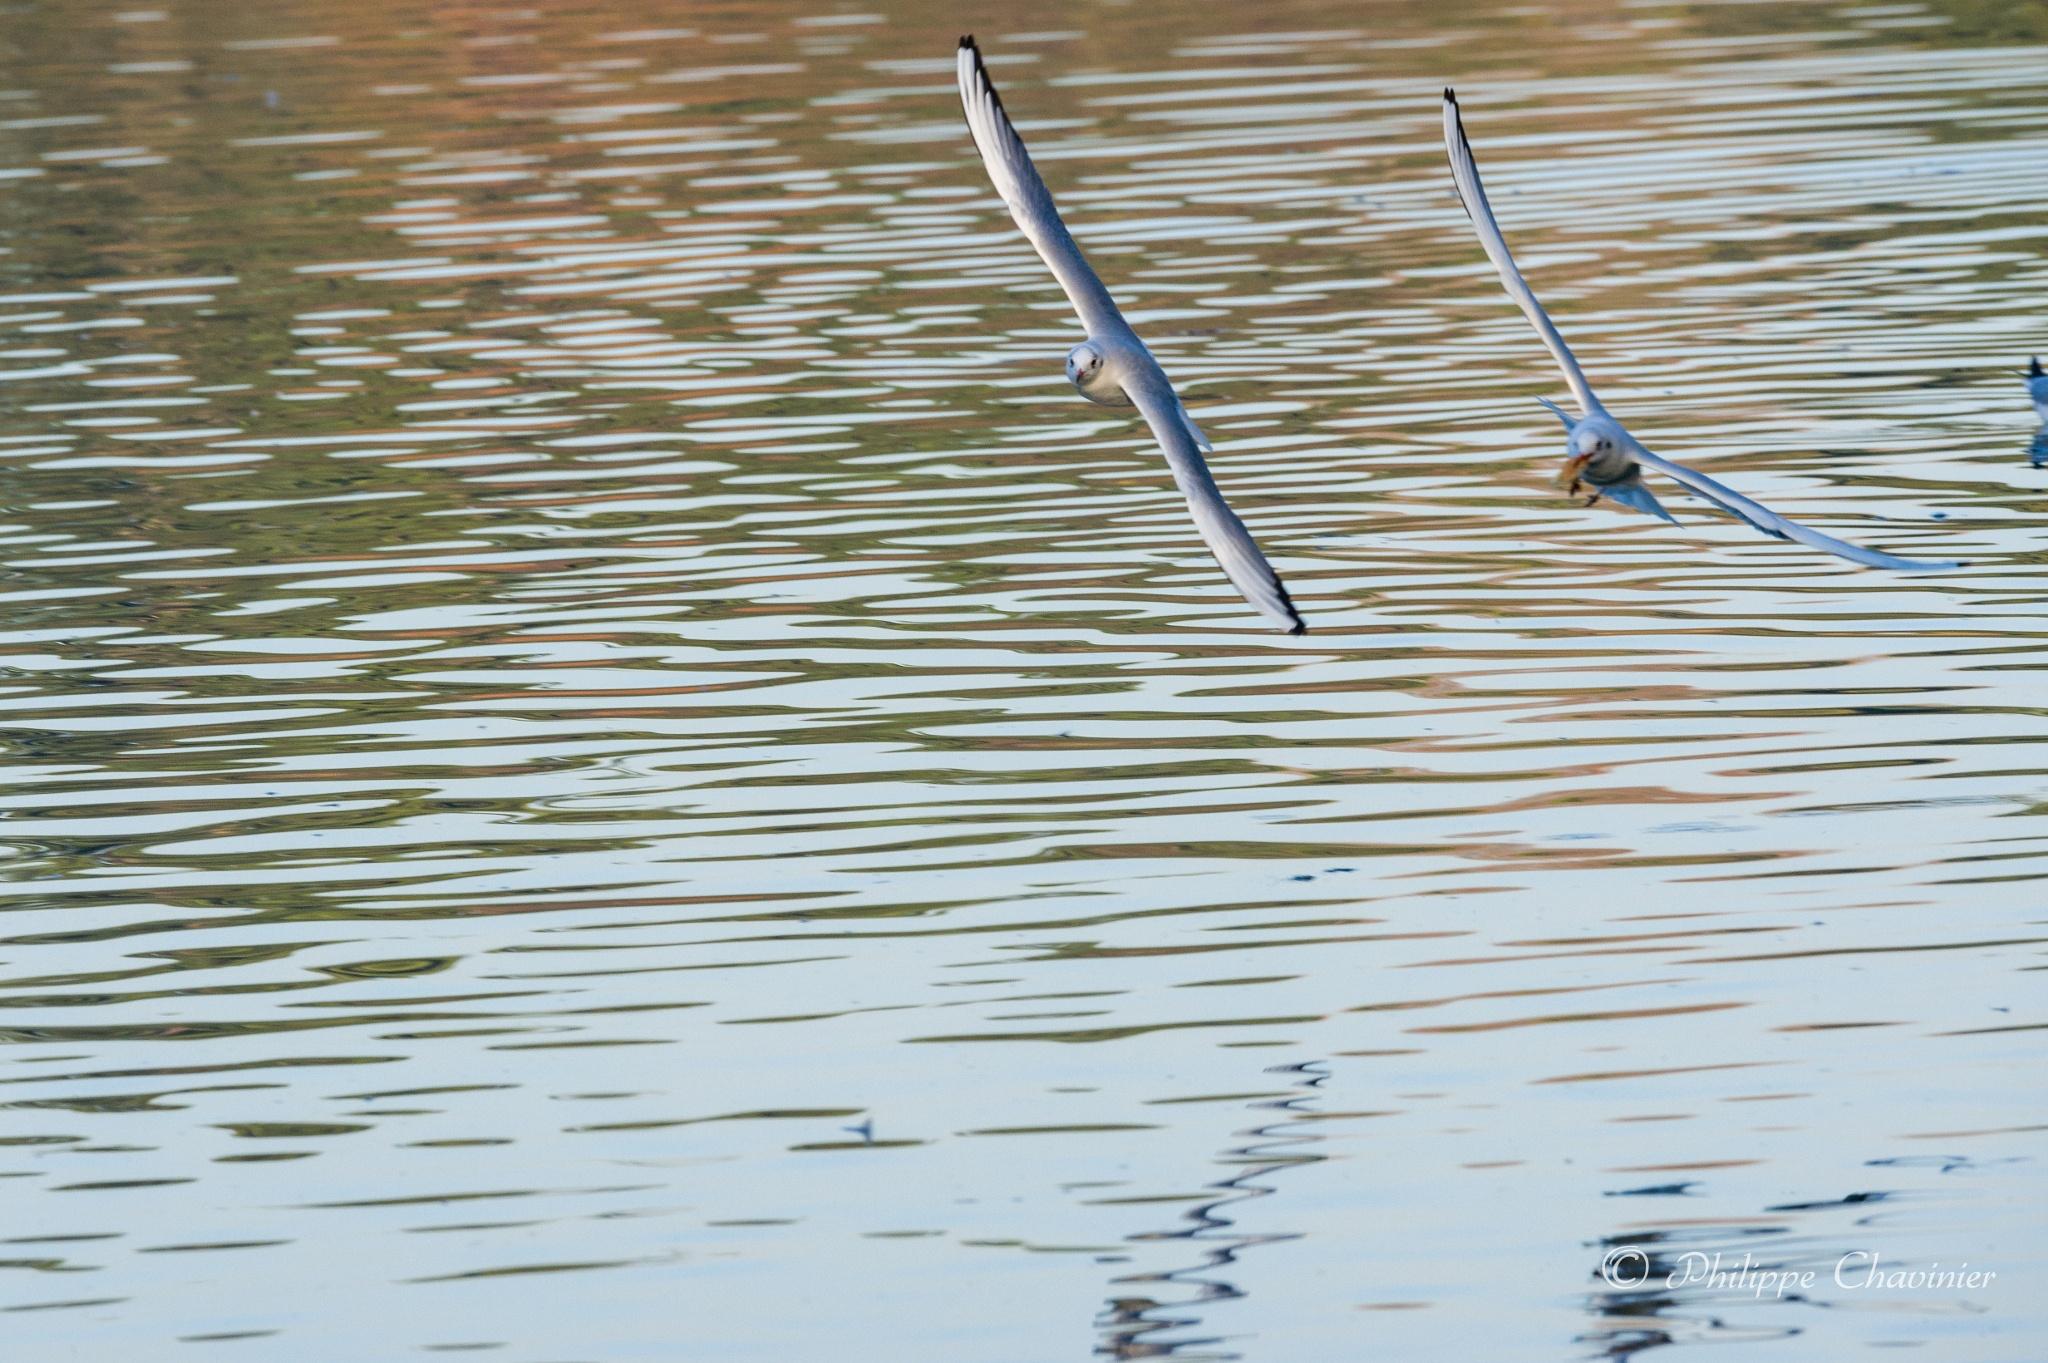 Seagulls sky battle by Philippe Chavinier